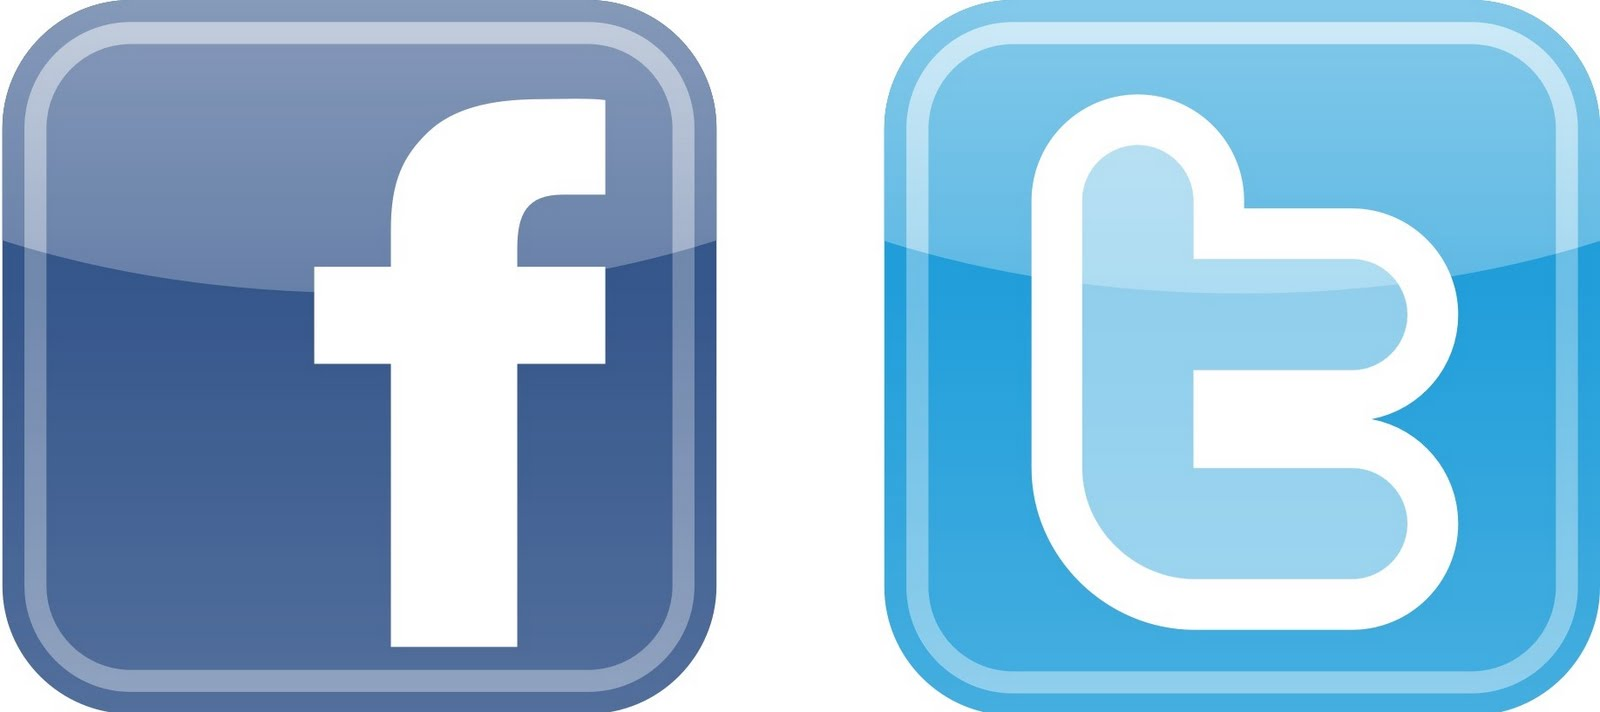 U b v gestion ambiental el twiter y la guerra psicologica for R s bains twitter